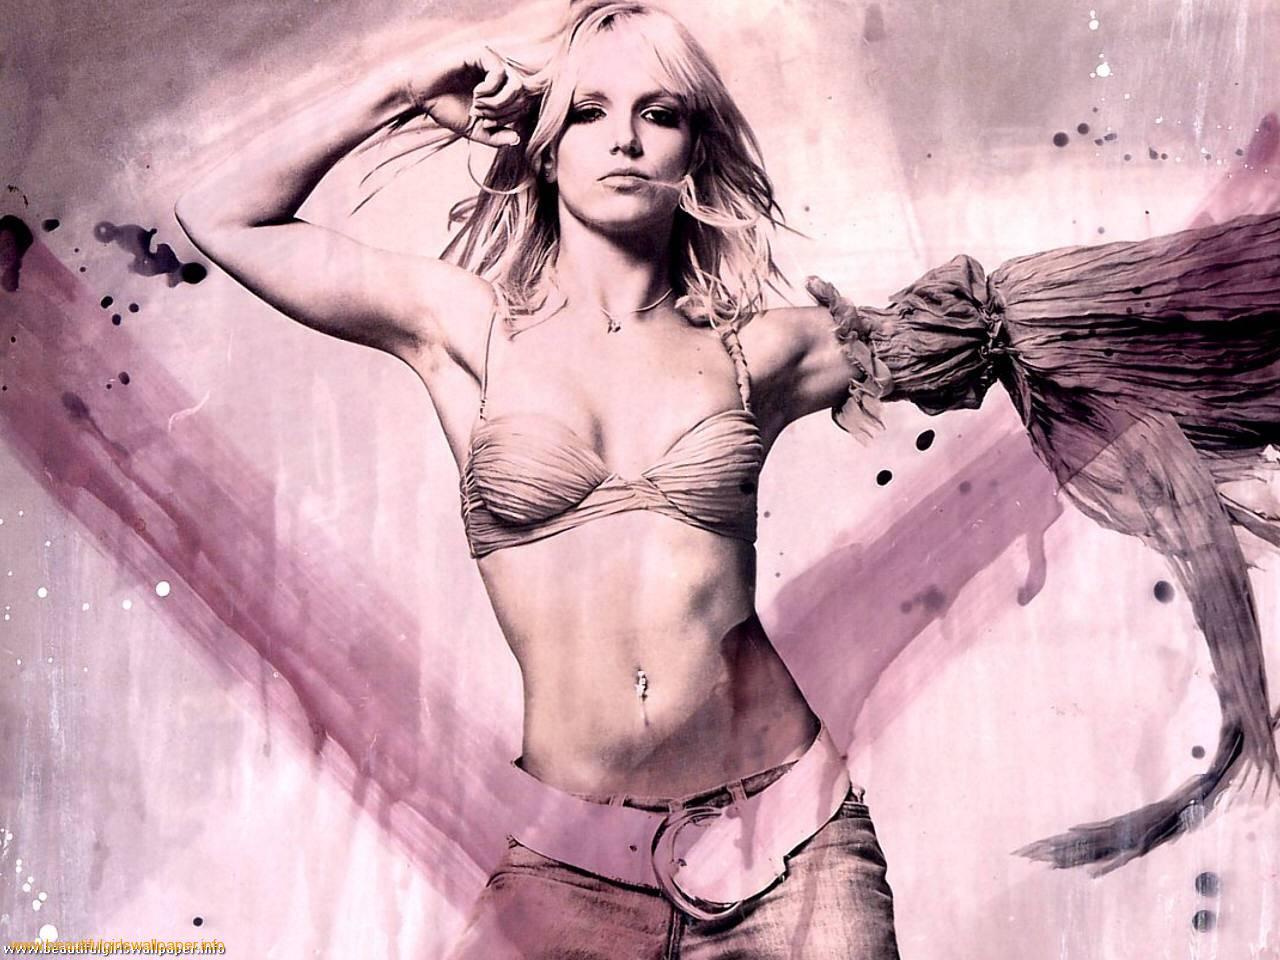 http://2.bp.blogspot.com/_aXFb3vEguRk/TK4CK2I9OhI/AAAAAAAADGk/6uzUc4u1oM8/s1600/Britney-Spears-1853-1.jpeg